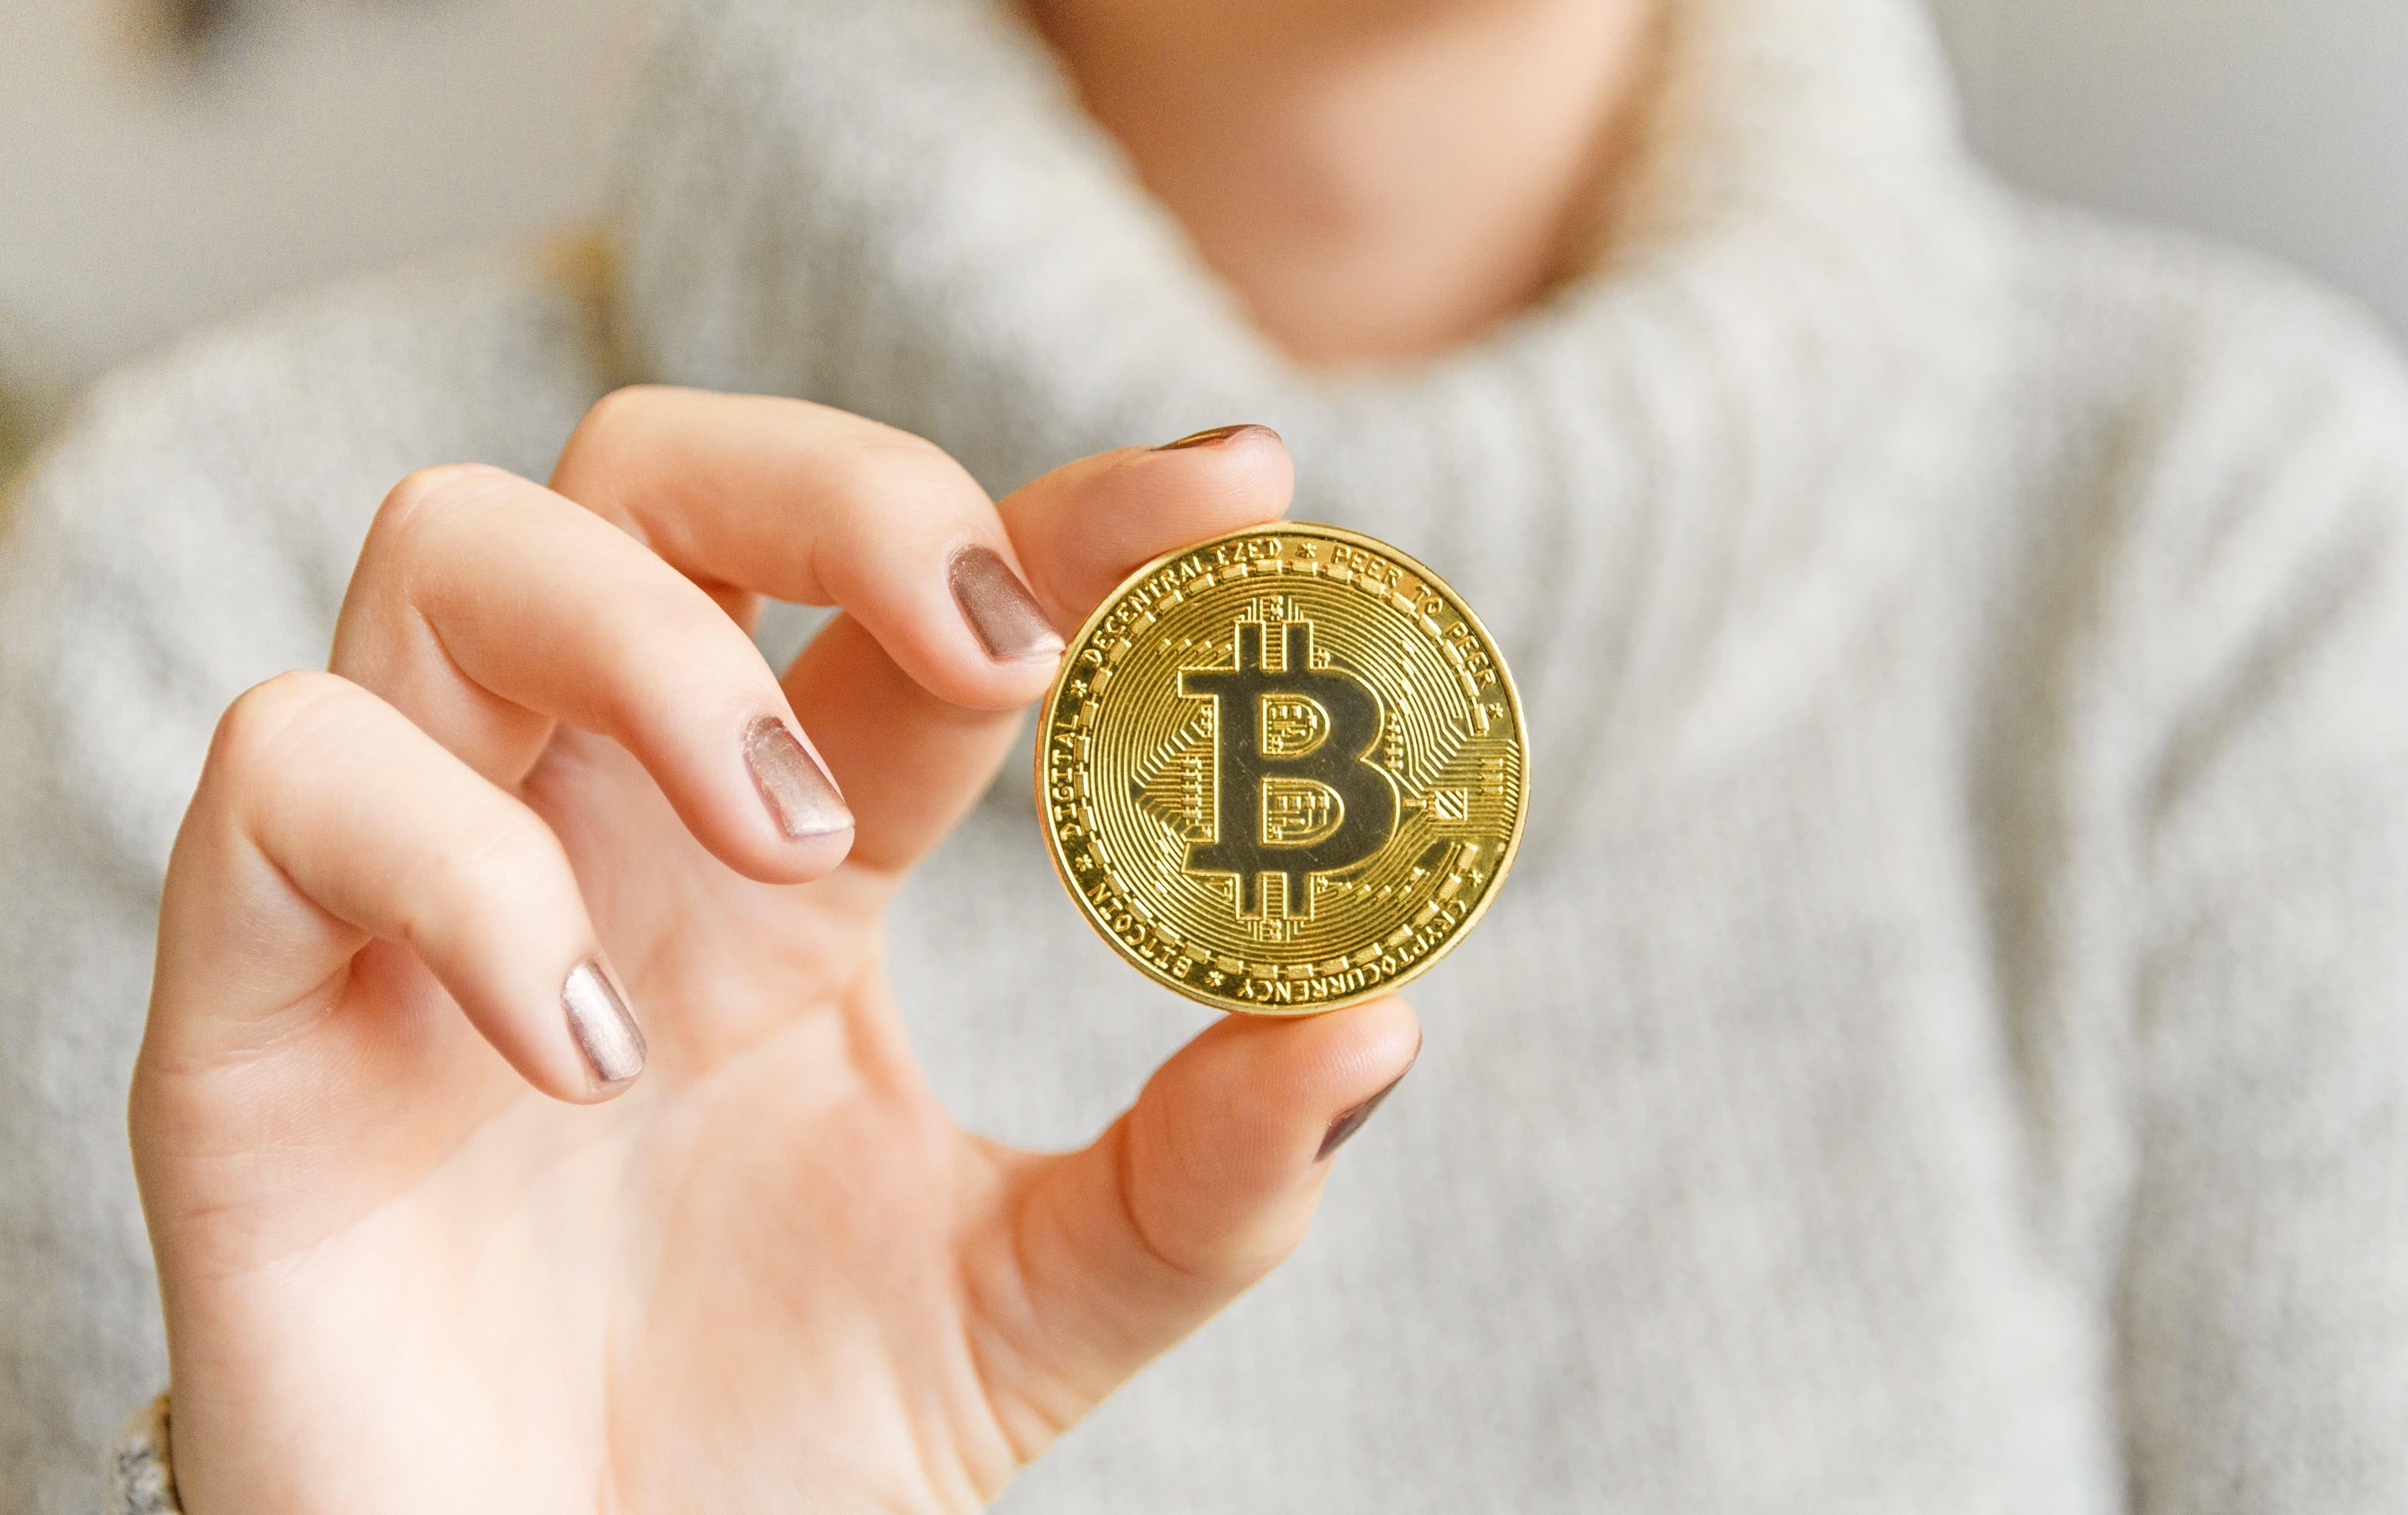 Korancrypto - Nilai Investasi Bitcoin Tembus 50.000 Dollar AS dalam Satu Pekan